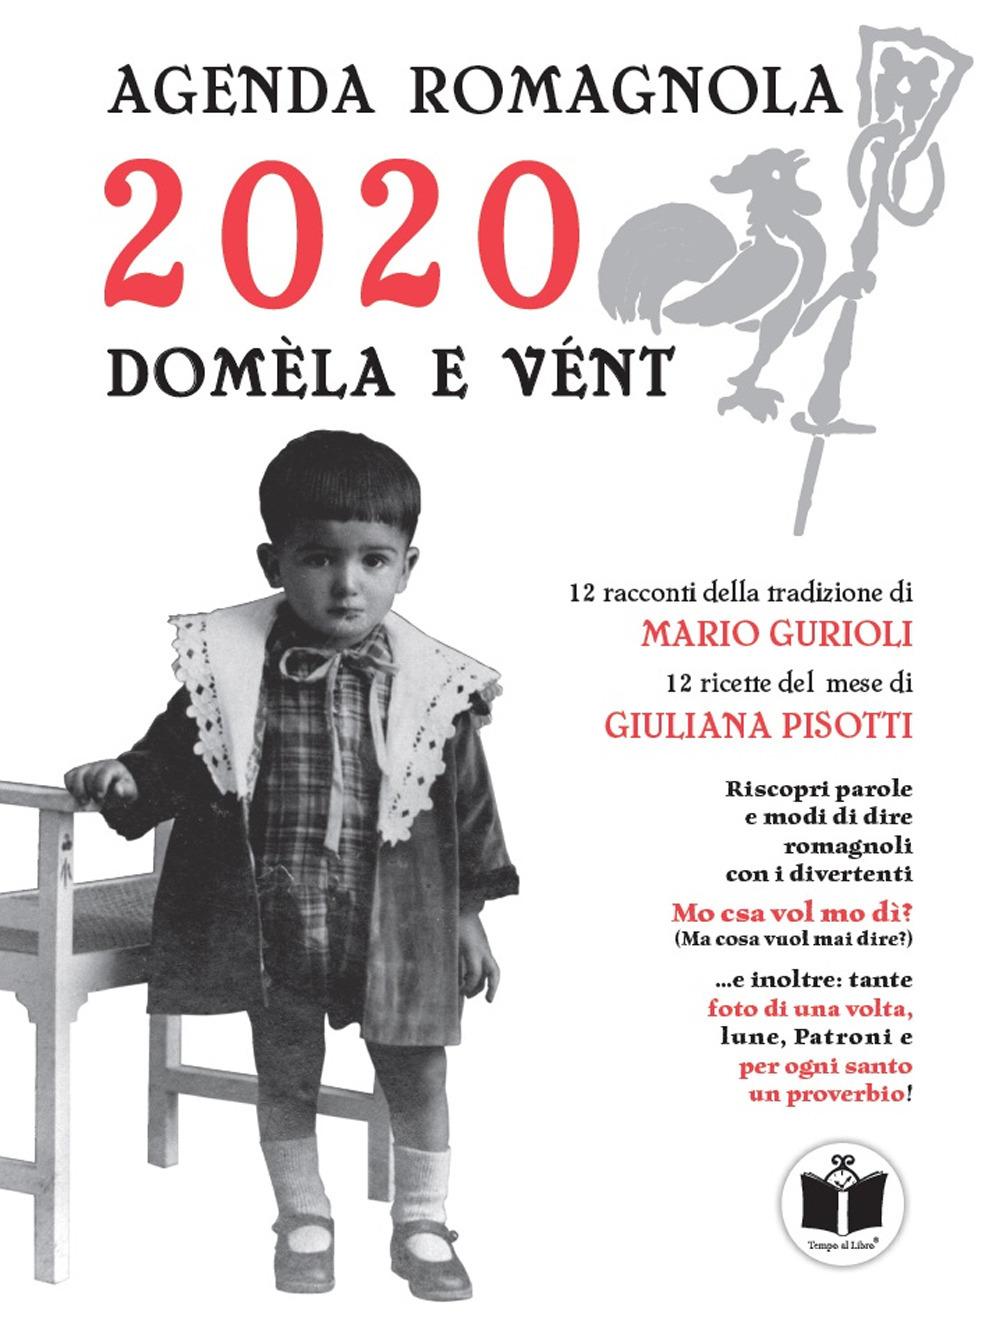 Mario Gurioli;Giuliana Pisotti Domèla e vént. Agenda romagnola 2020 Mario Gurioli;Giuliana Pisotti ISBN:9788832157109